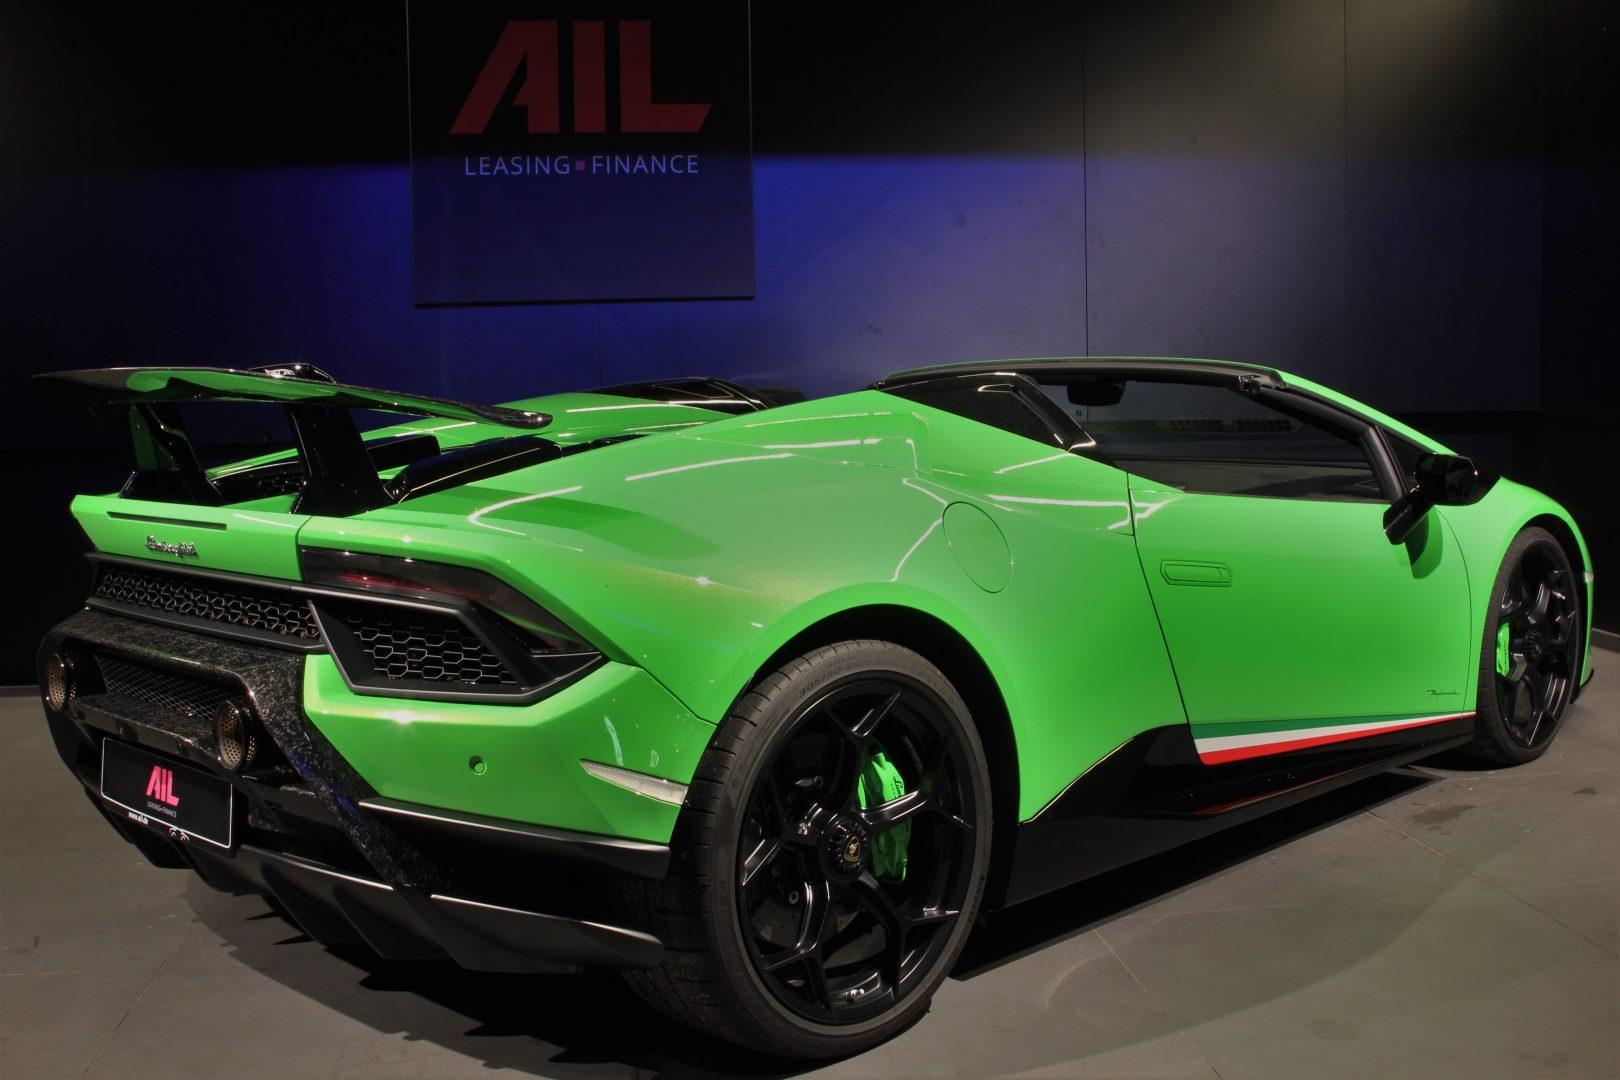 AIL Lamborghini Huracan Performante Spyder LP 640-4 Verda Mantis 3